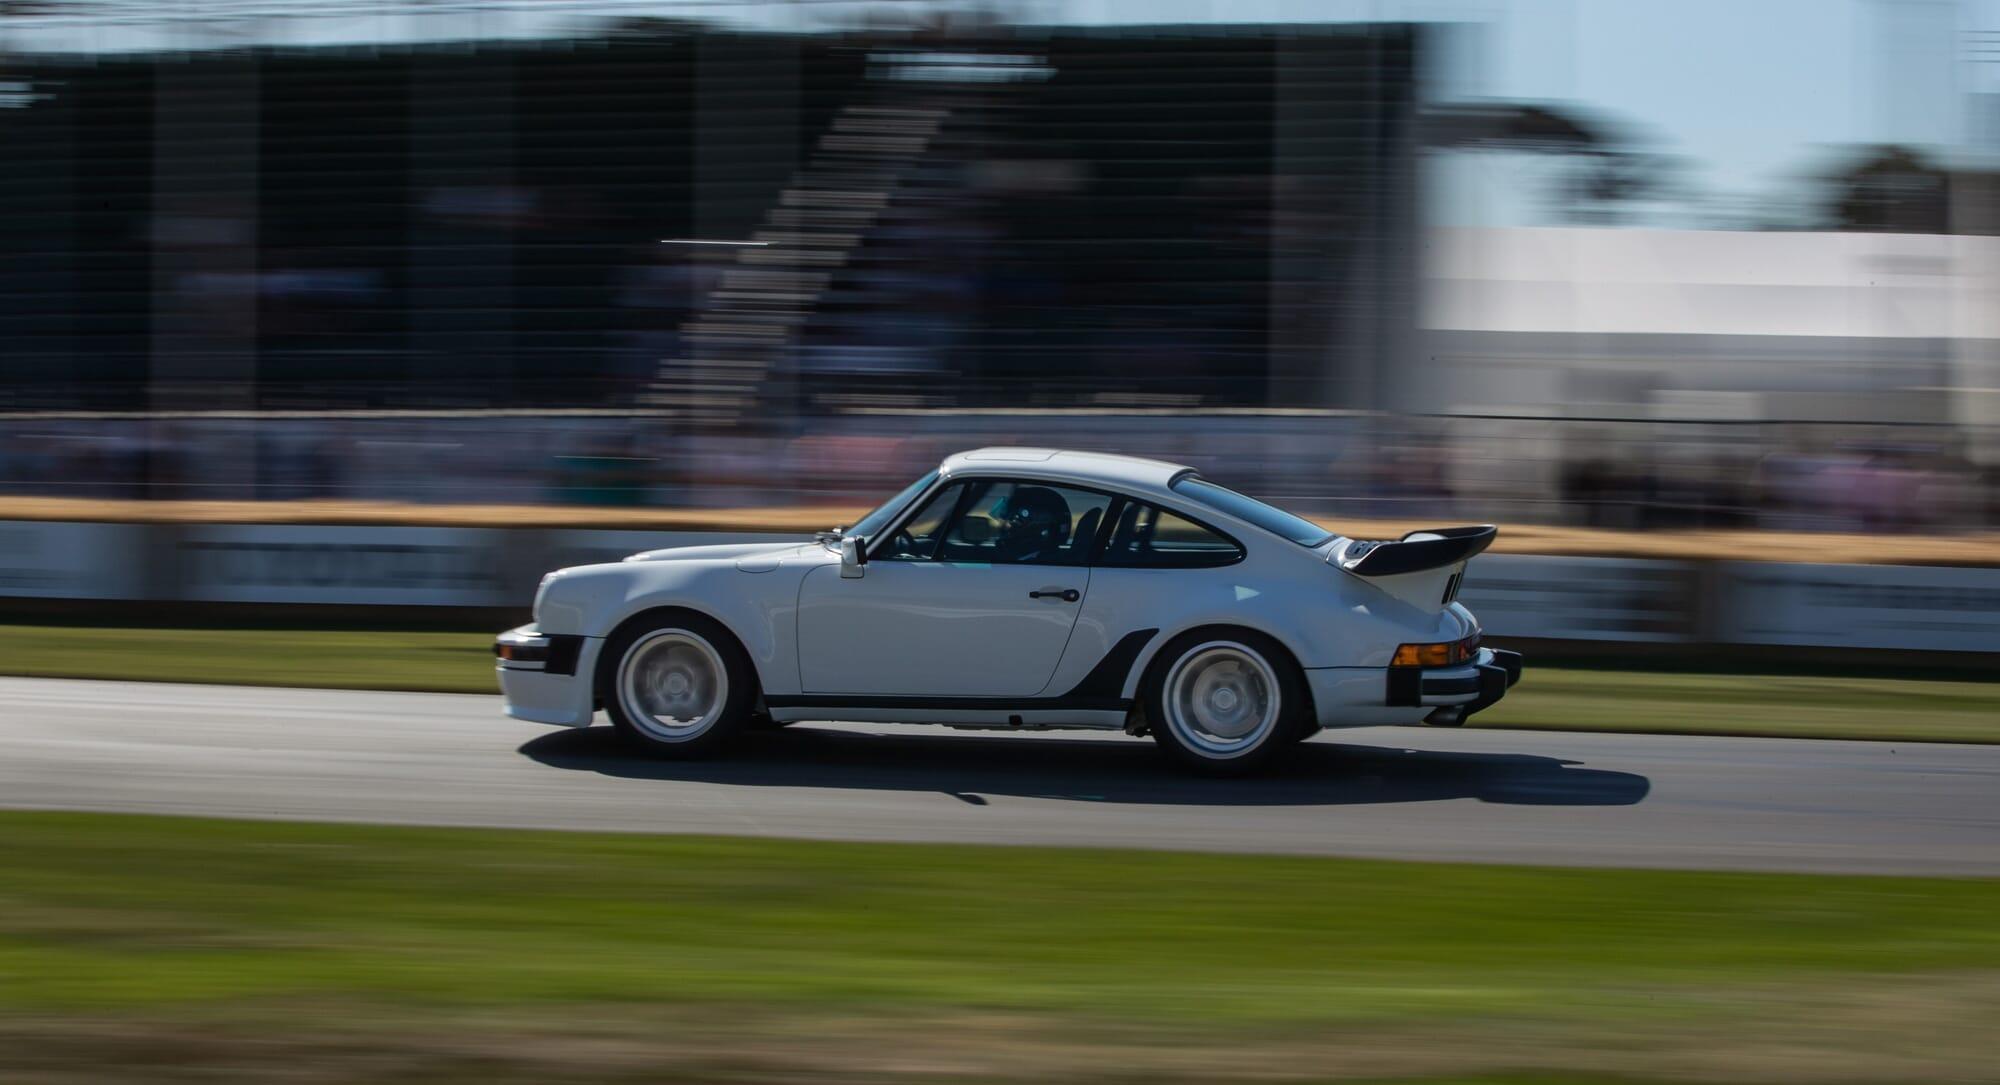 Porsche 930 TAG Turbo: Formula One power in a road car